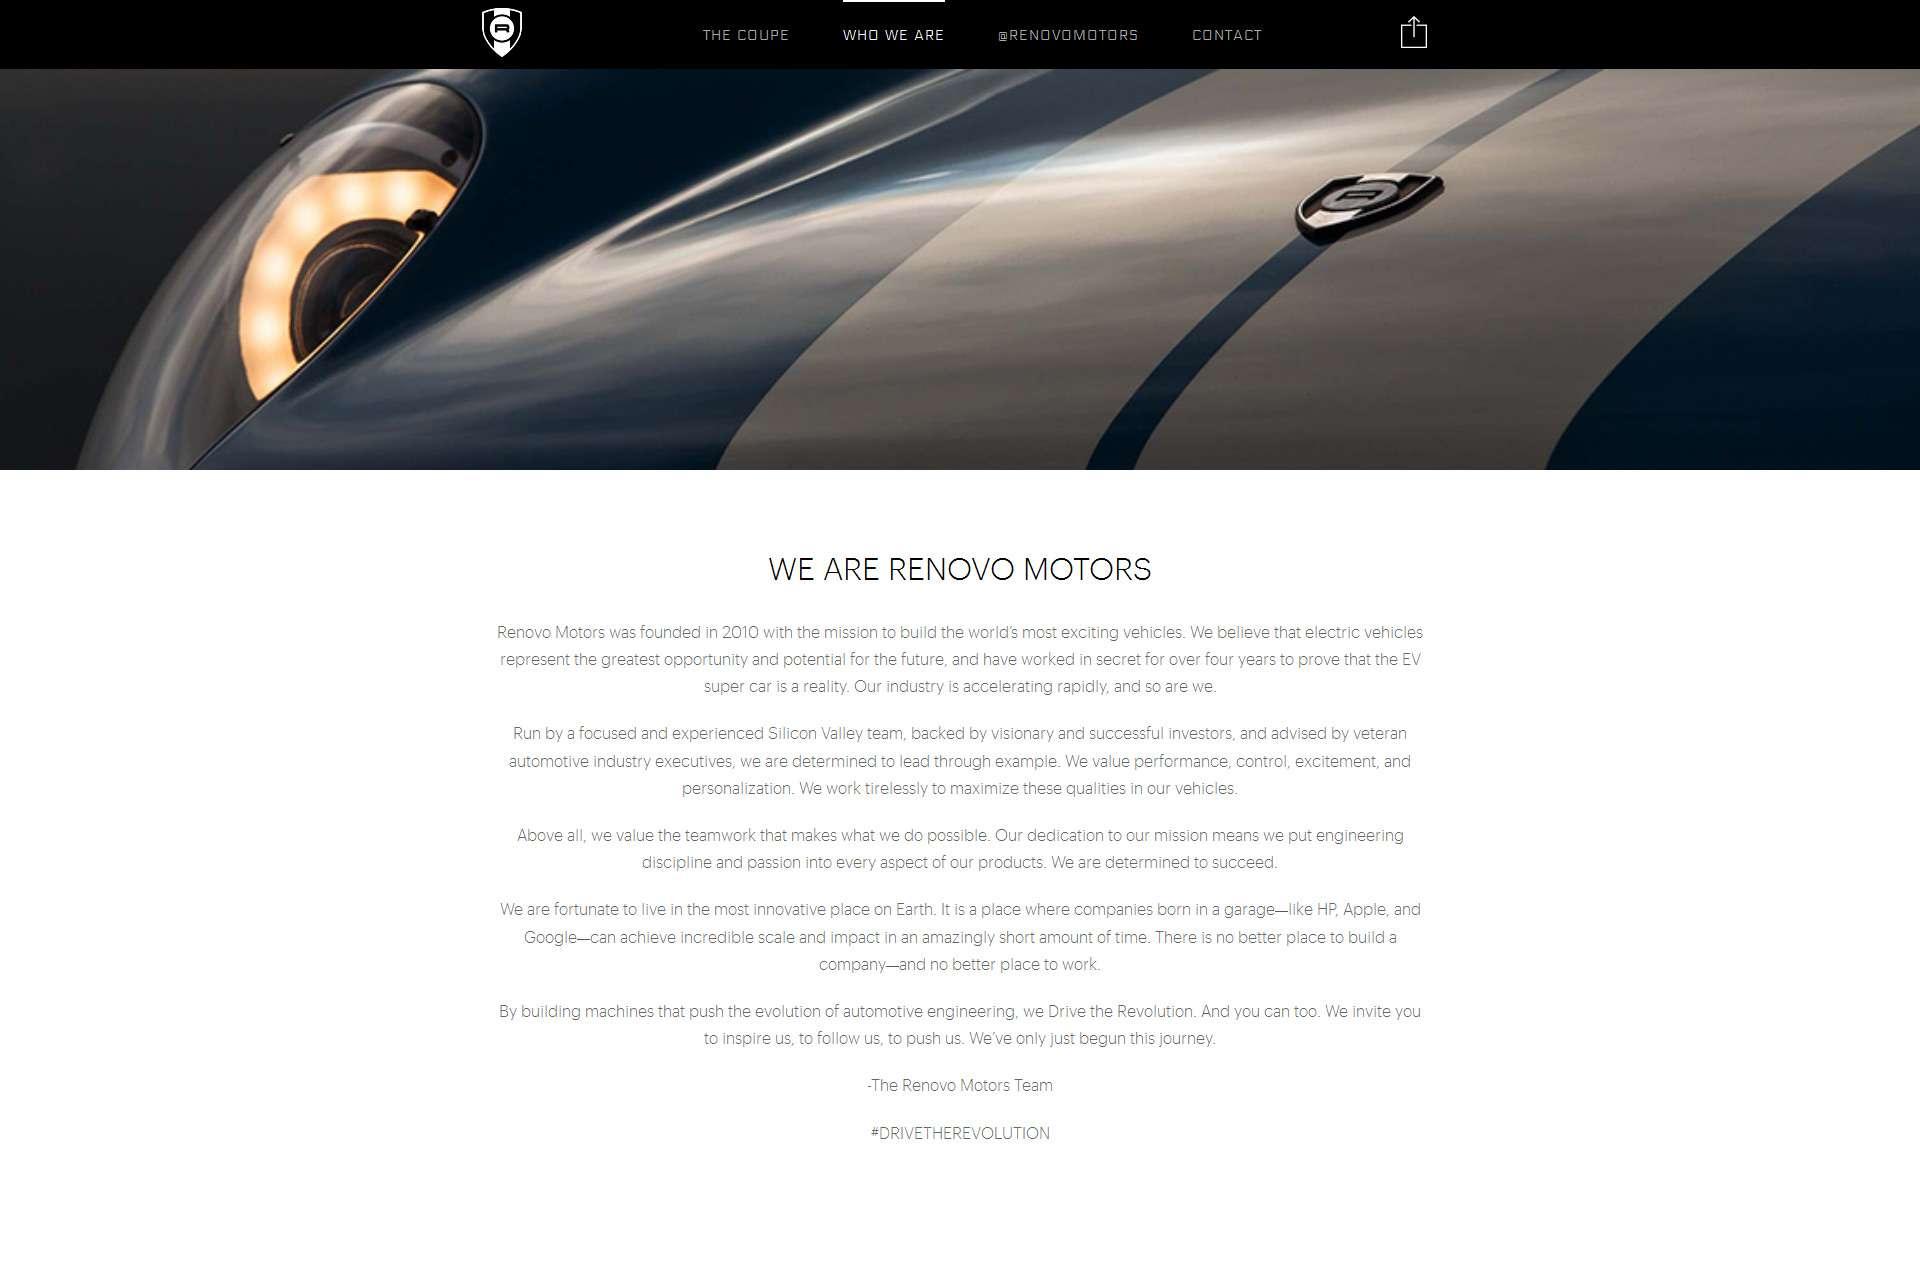 Renovo-motors-who